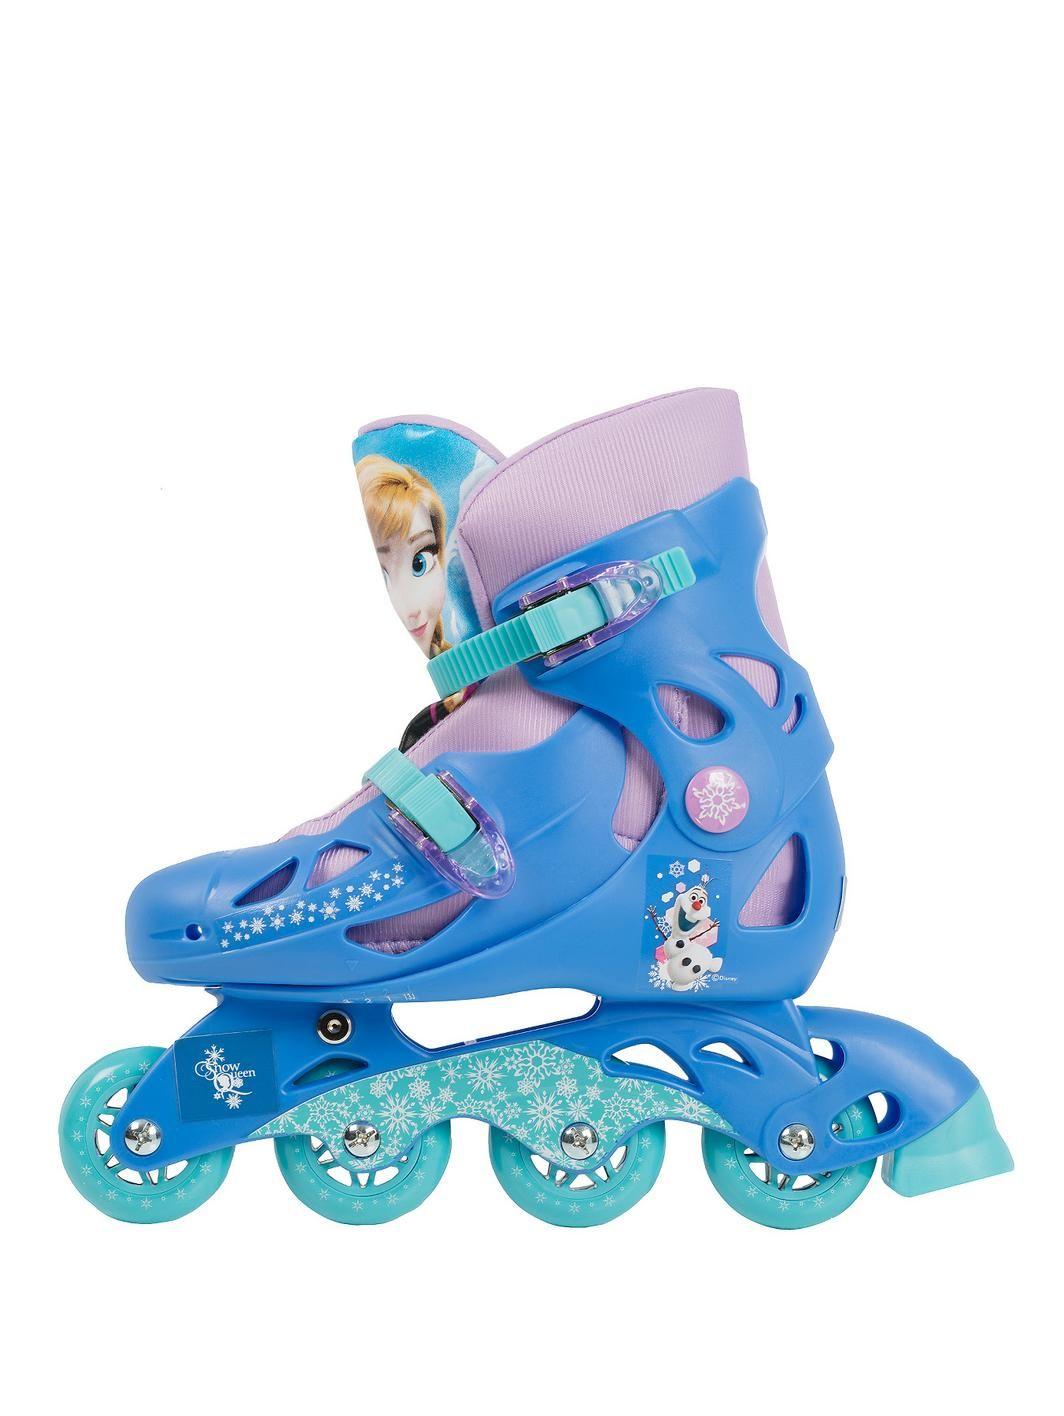 Frozen roller skates walmart - Inline Skates Http Www Very Co Uk Disney